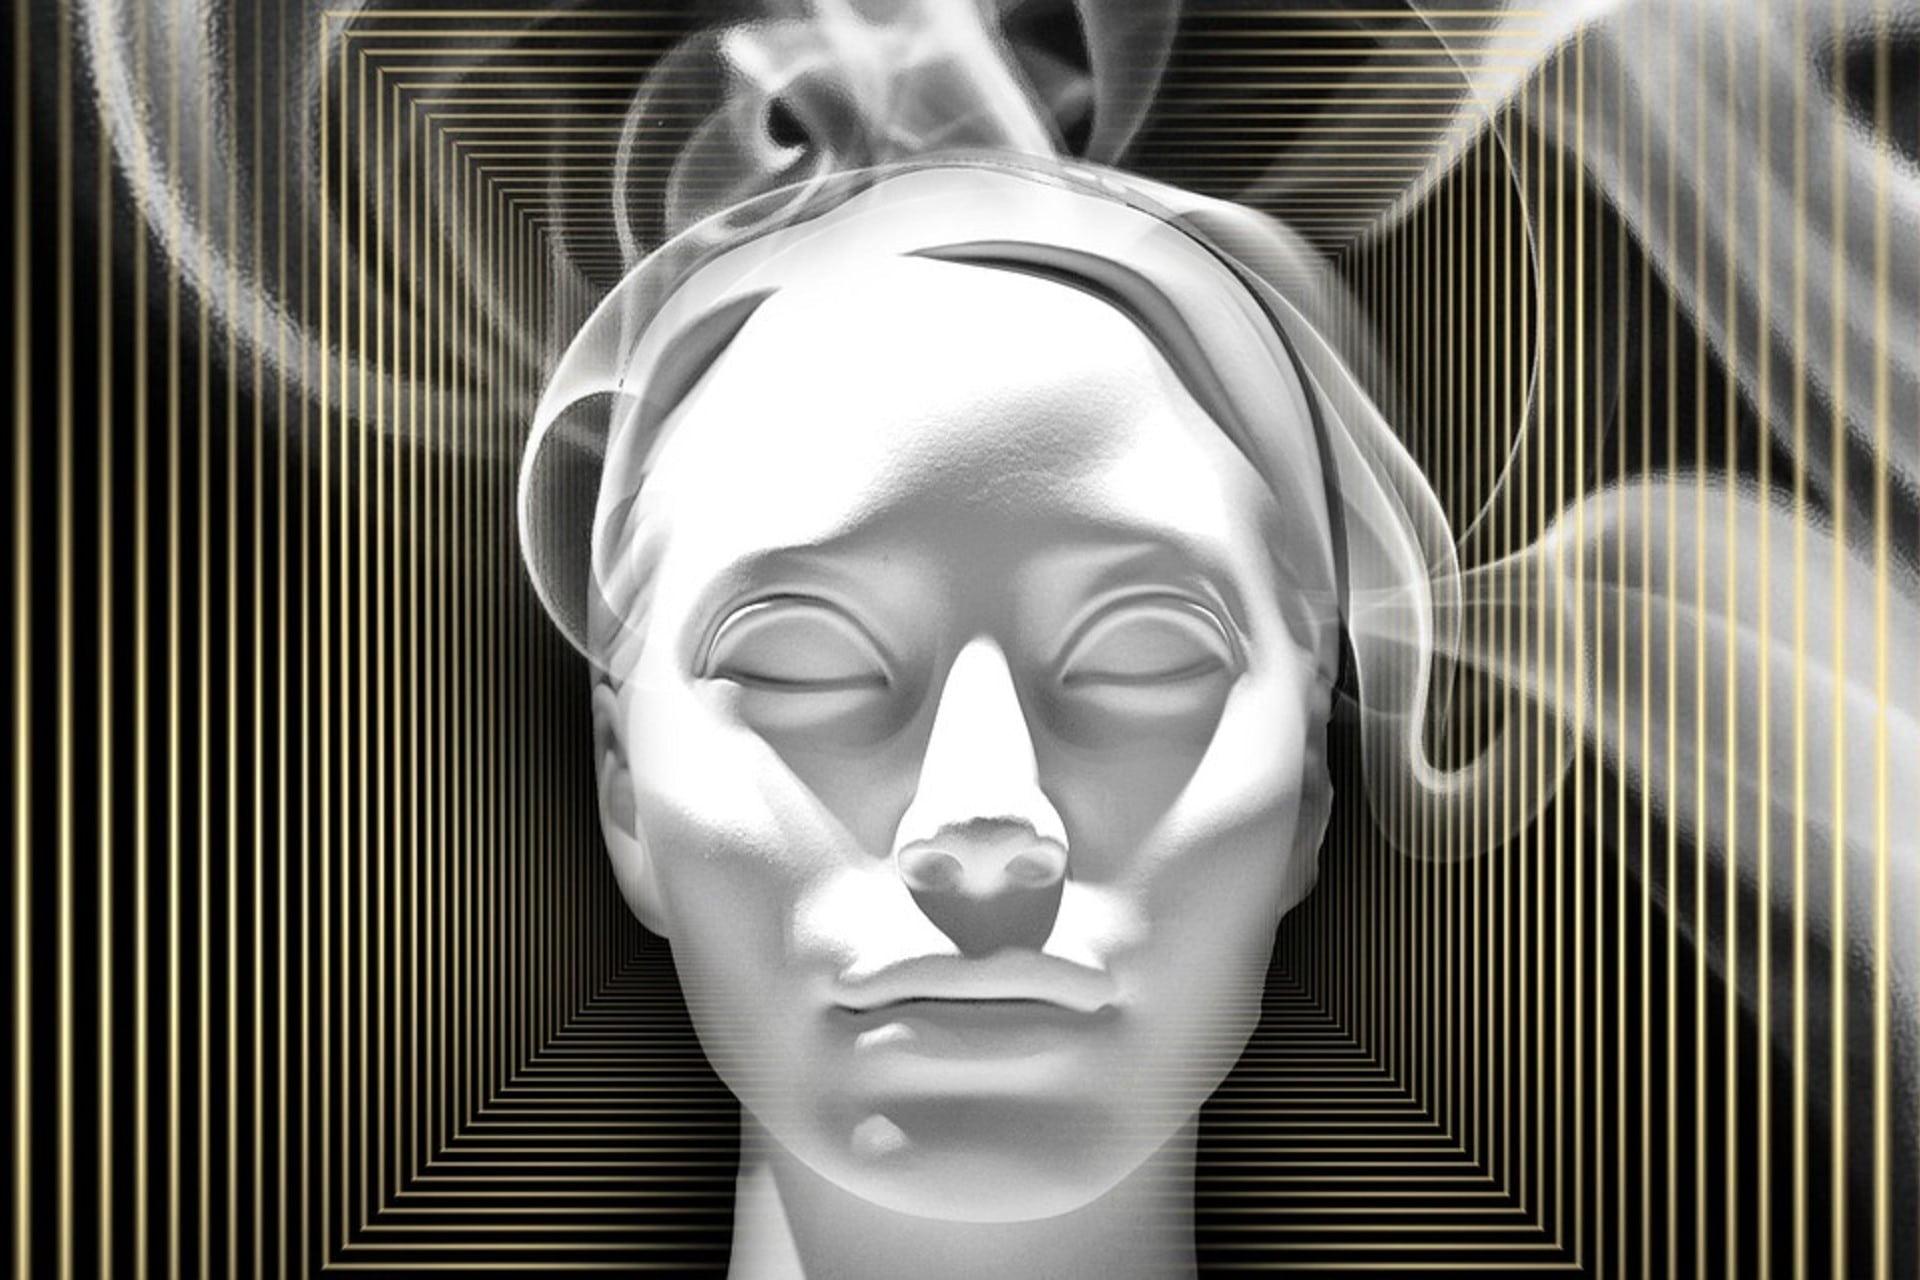 face through light and smoke